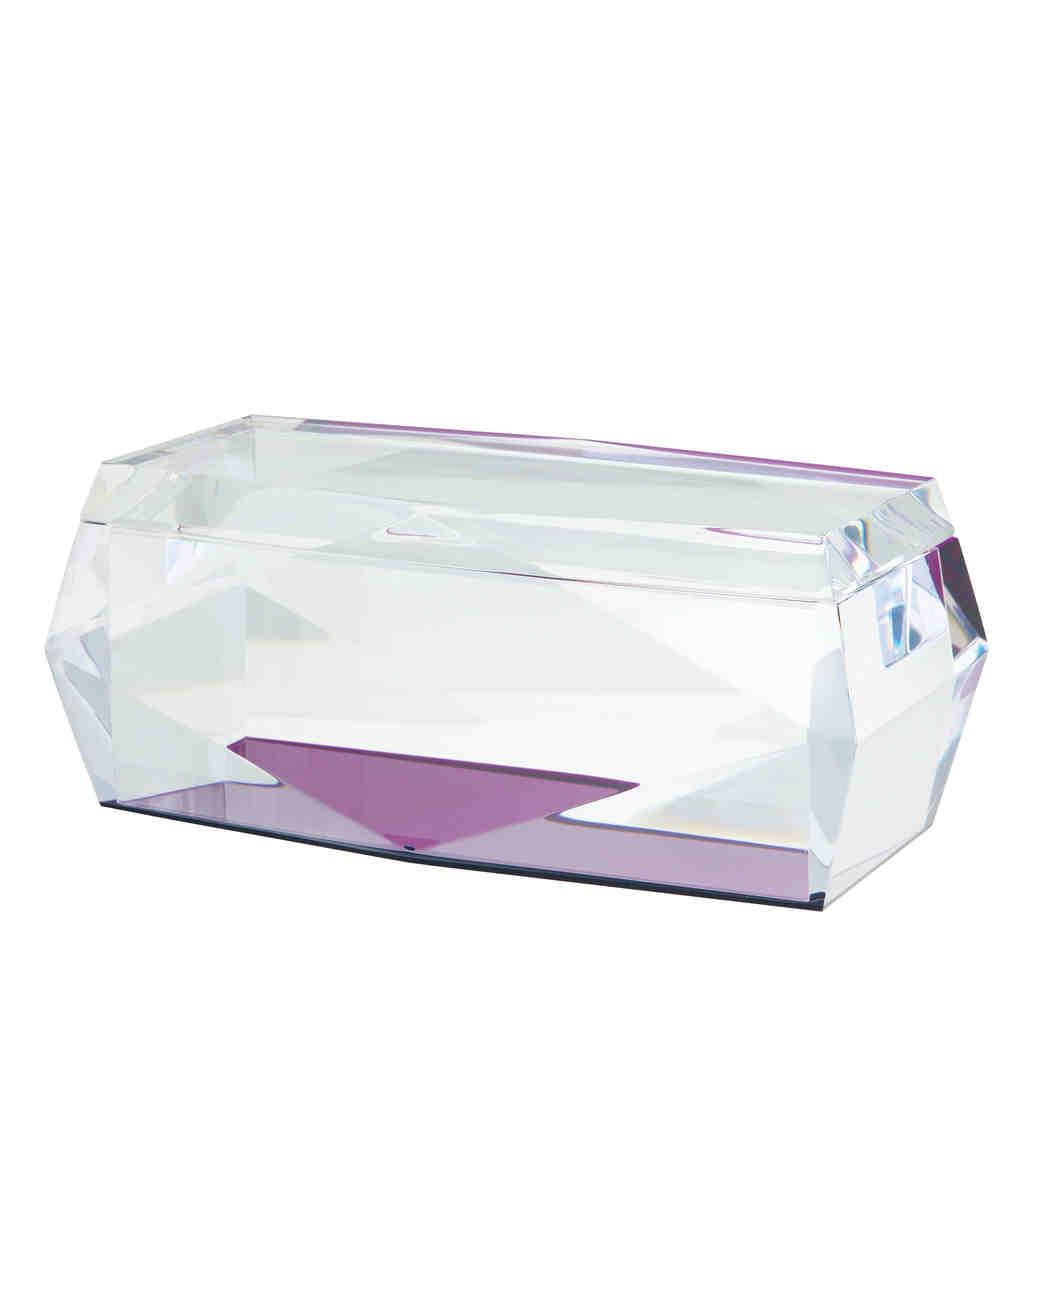 jewelry-box-0811mwd107539.jpg